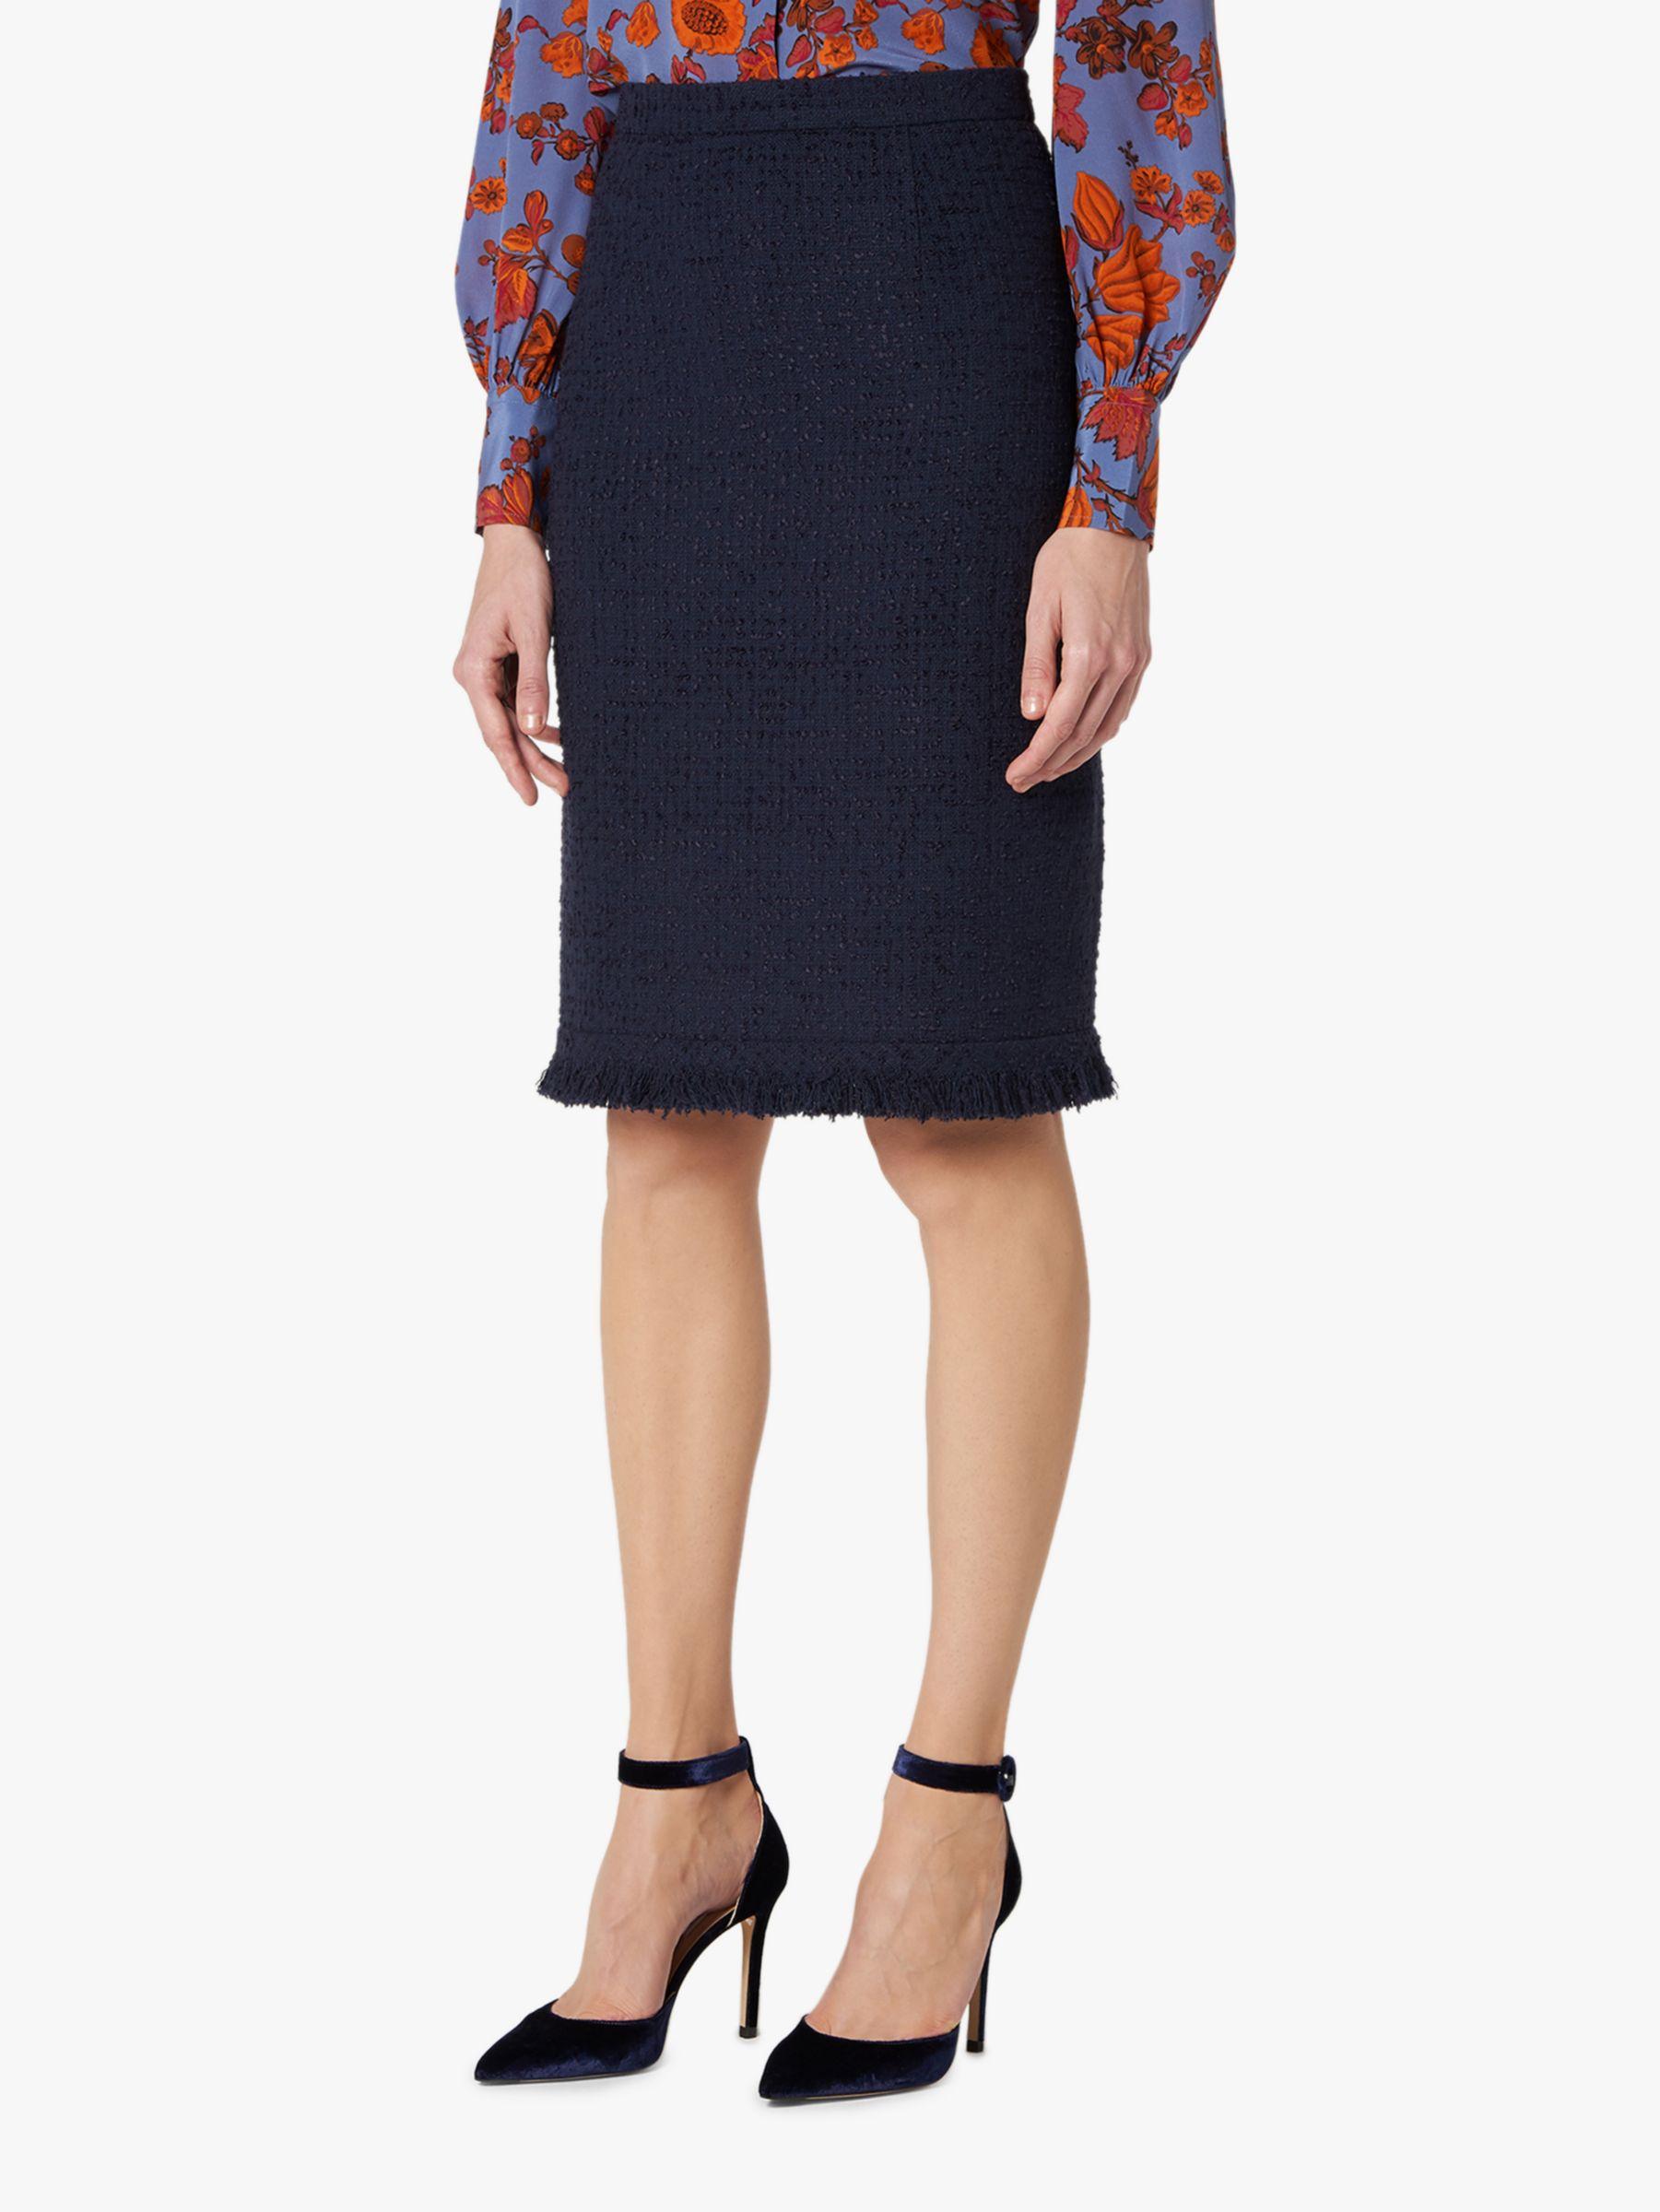 0725d64f53 L.K.Bennett Myia Tweed Skirt, Sloane Blue at John Lewis & Partners